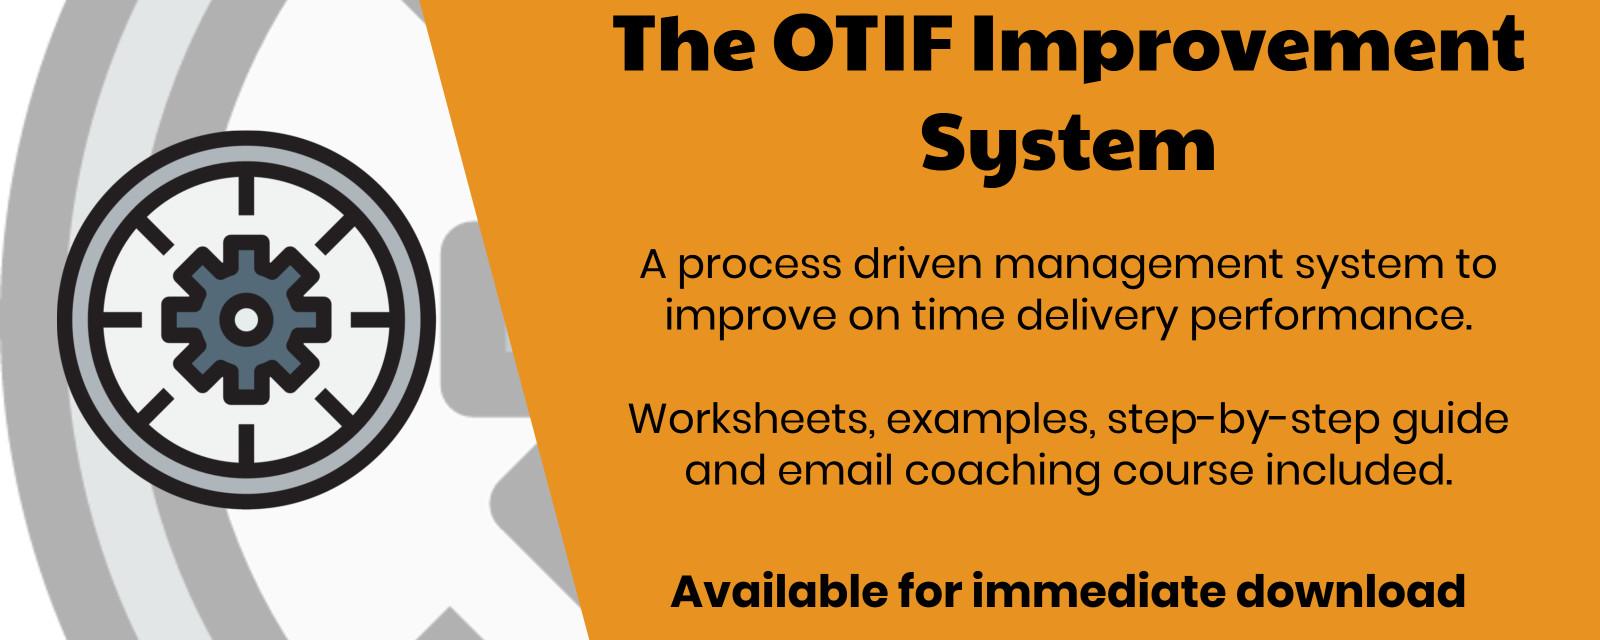 The OTIF Improvement System